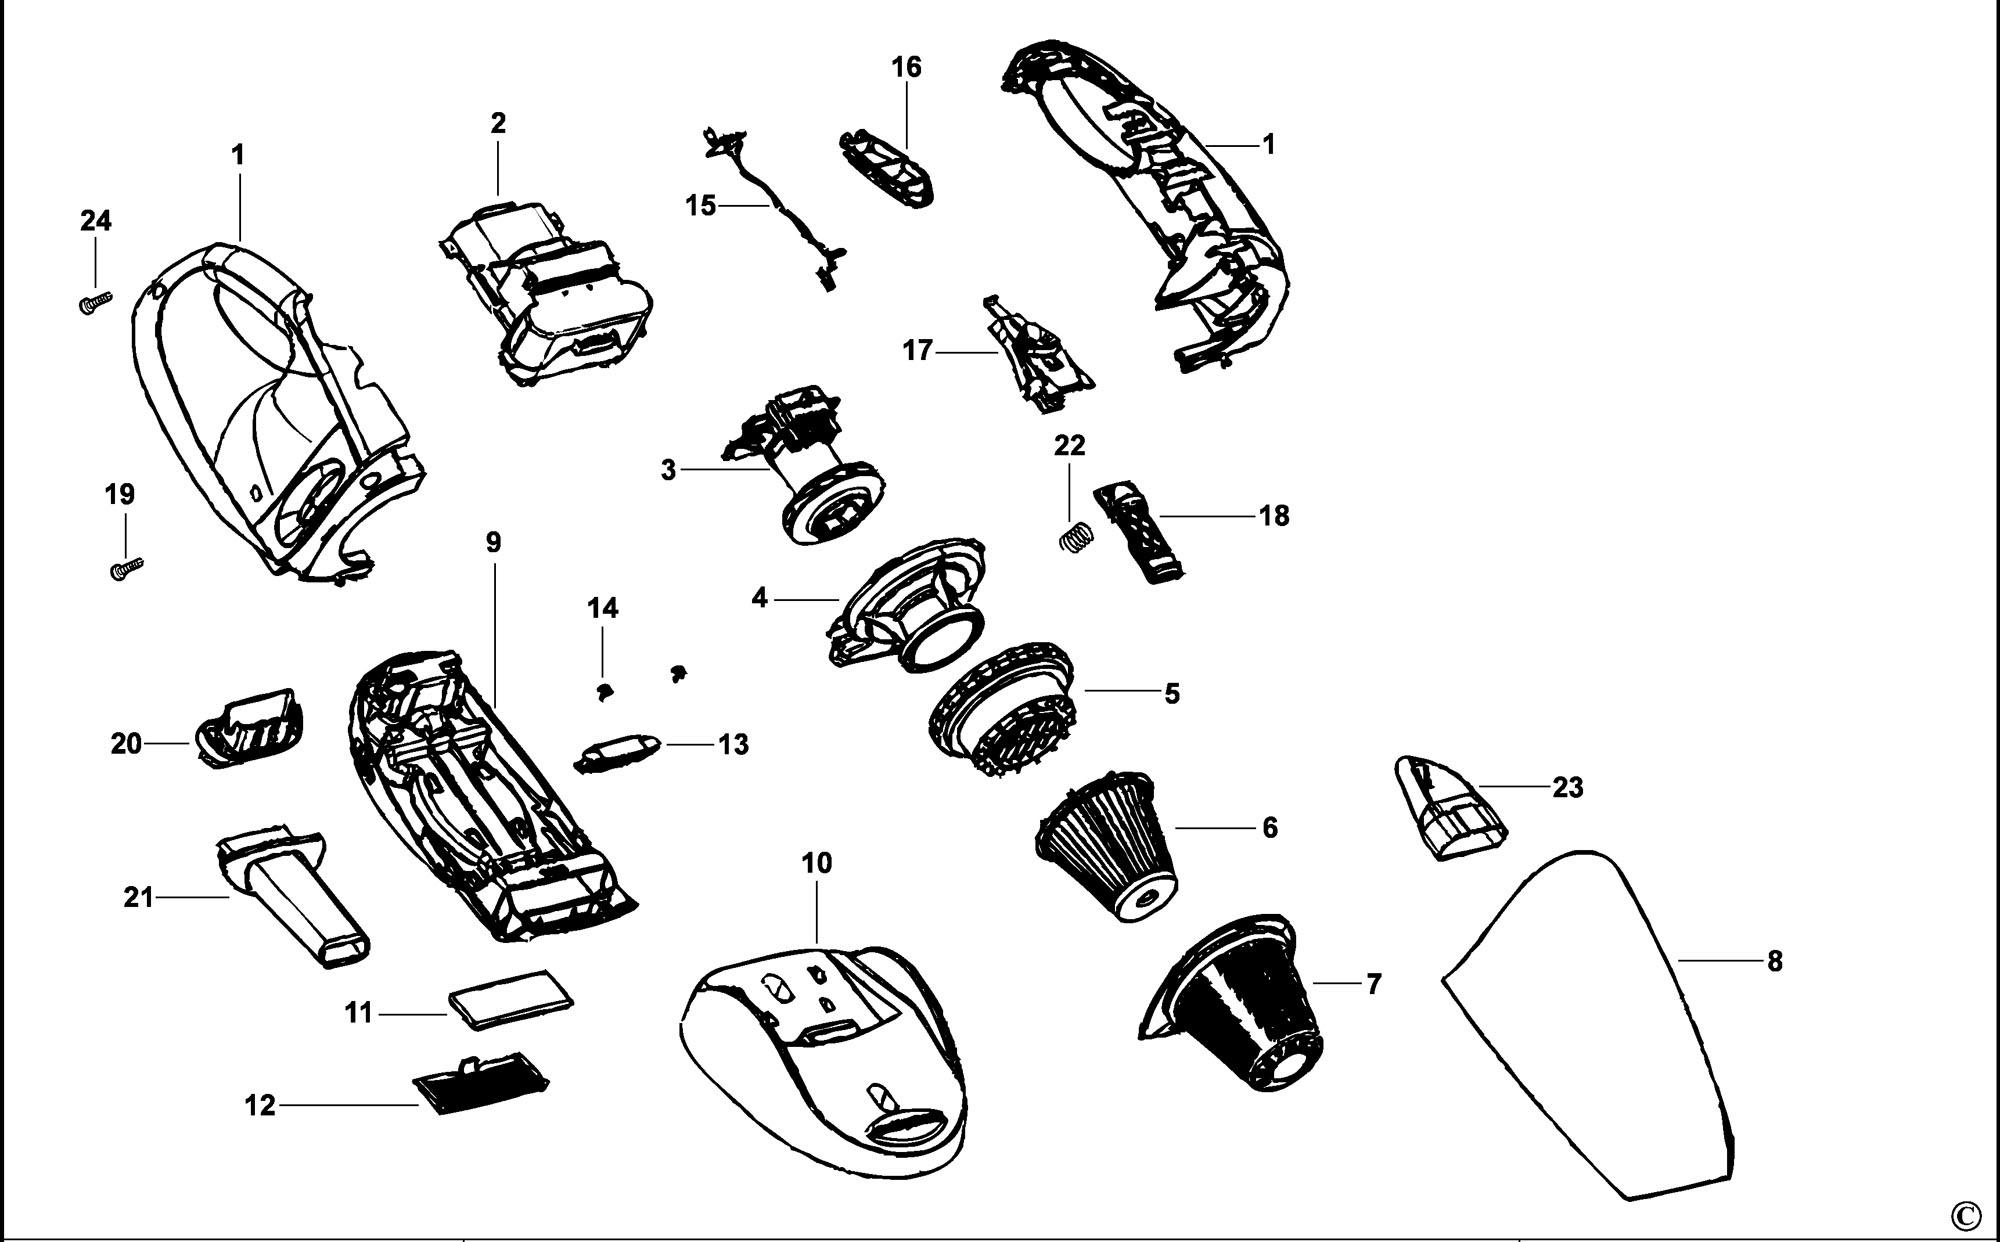 Spares for Black & Decker Cv1205 Dustbuster (type H1